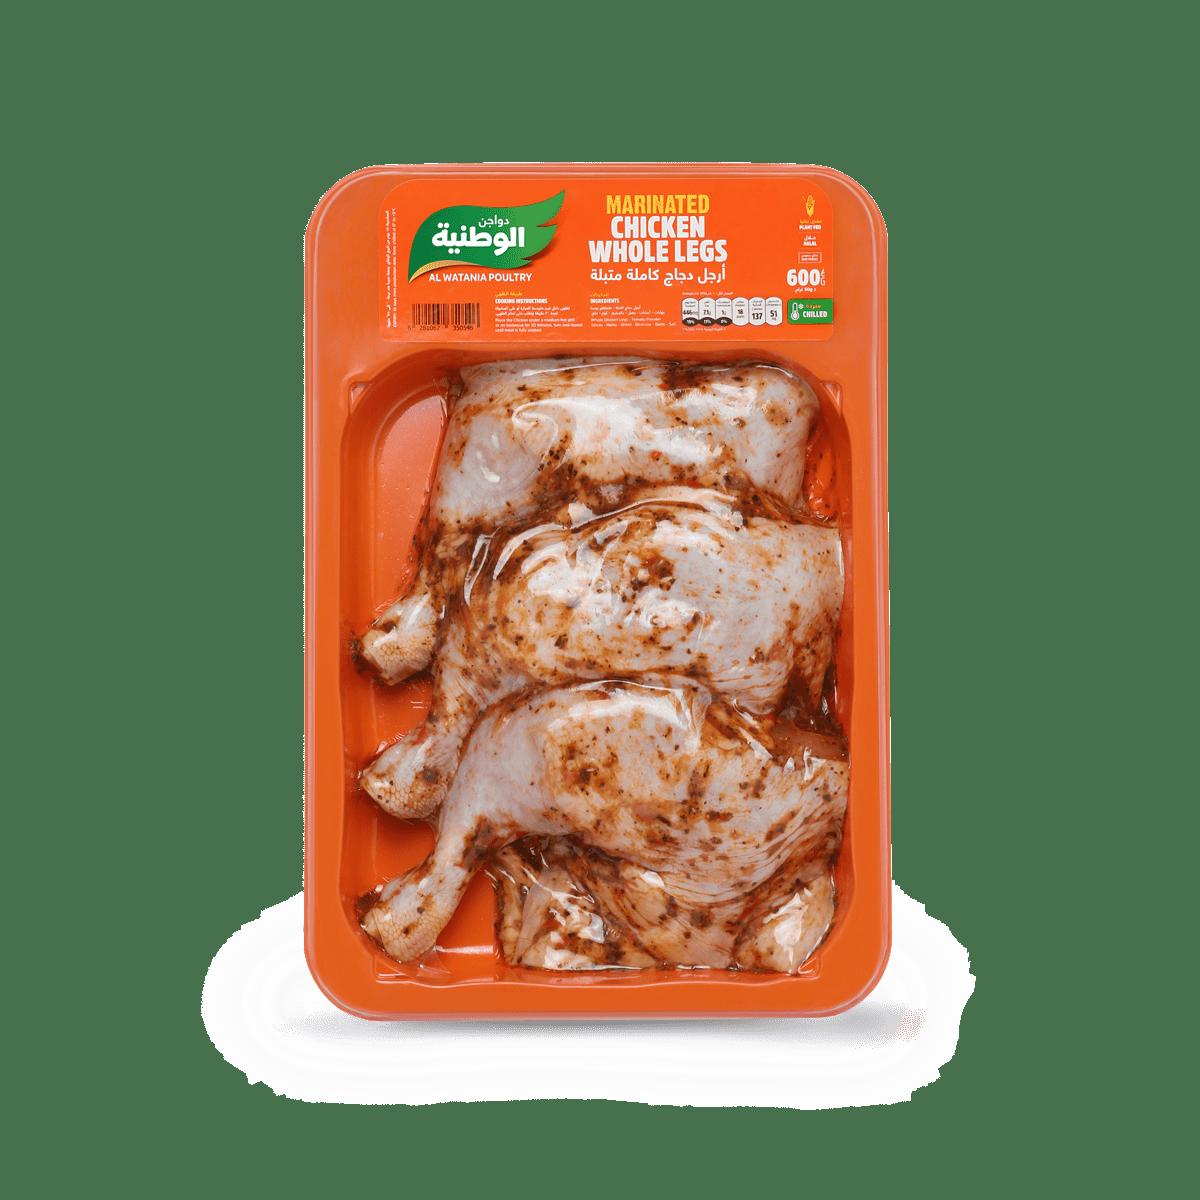 Marinated Chicken Whole legs